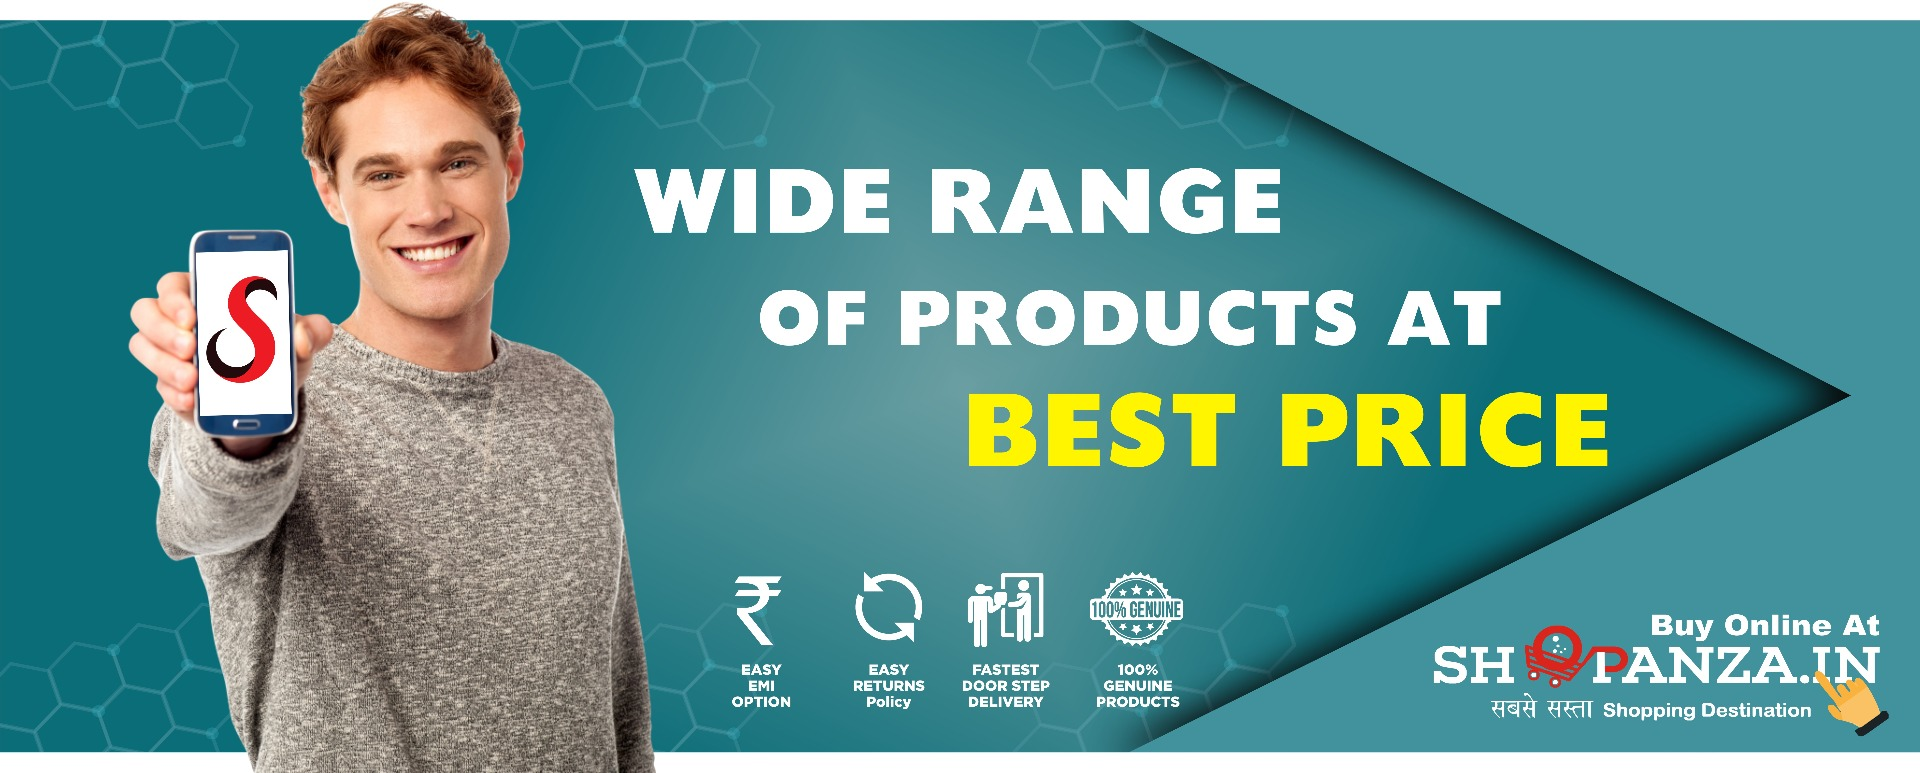 Maheshwari Sales - Electronics and Appliances Store in Ramdaspeth, Akola